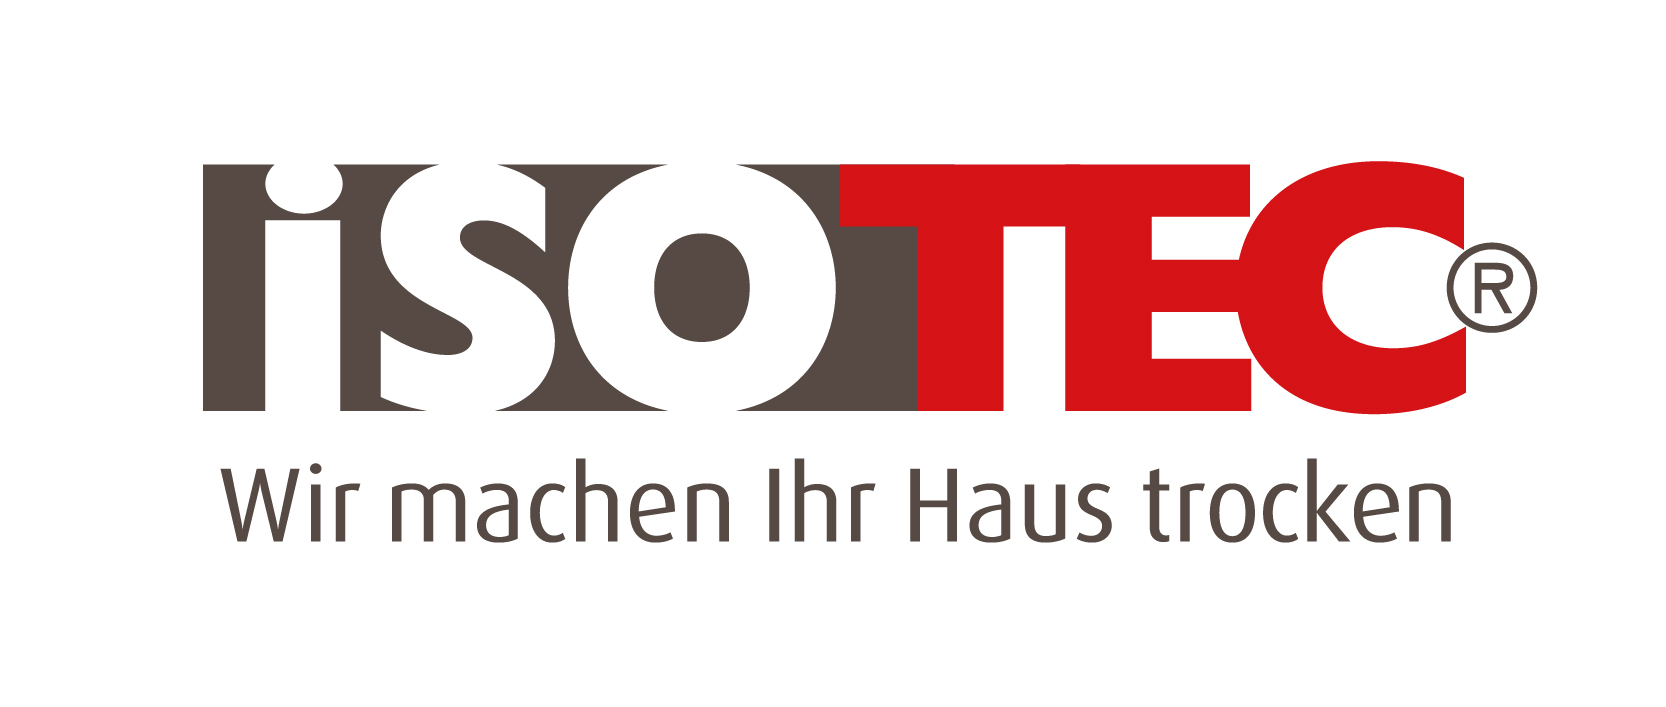 ISOTEC-Fachbetrieb Abdichtungssysteme Norbert Kroll Logo